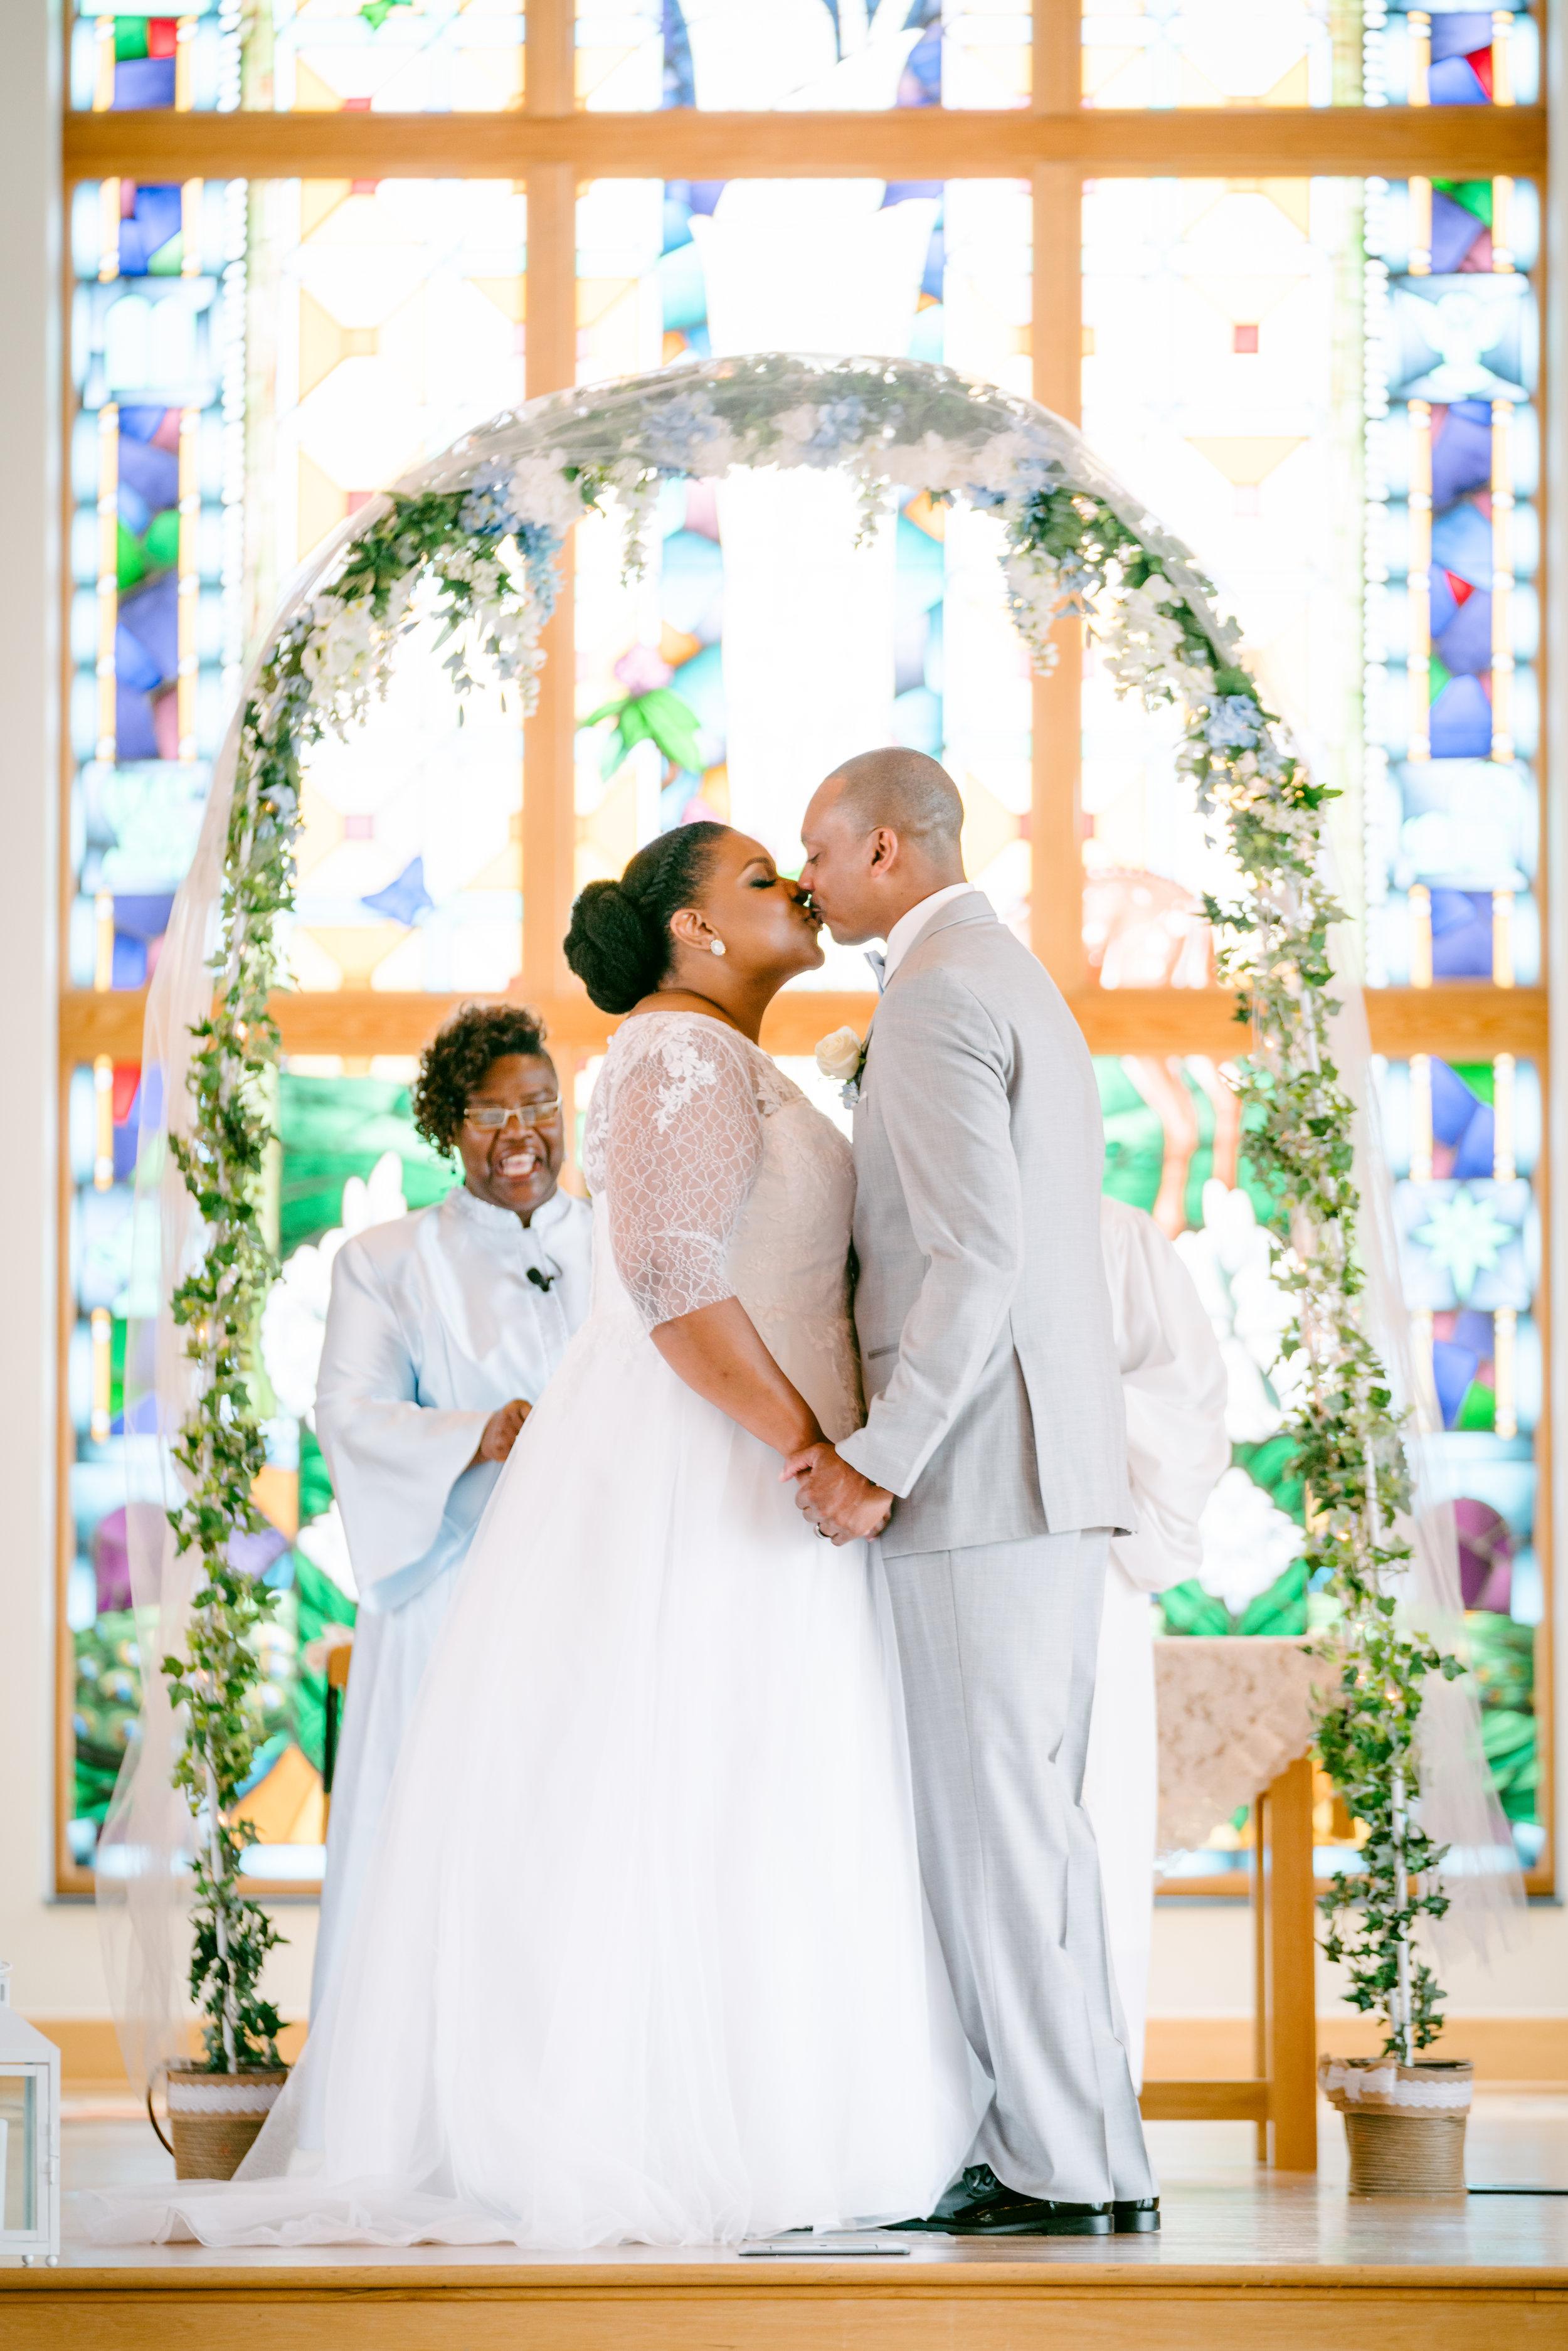 Wedding_PortMacyWeddingAlbum2017-9788.jpg